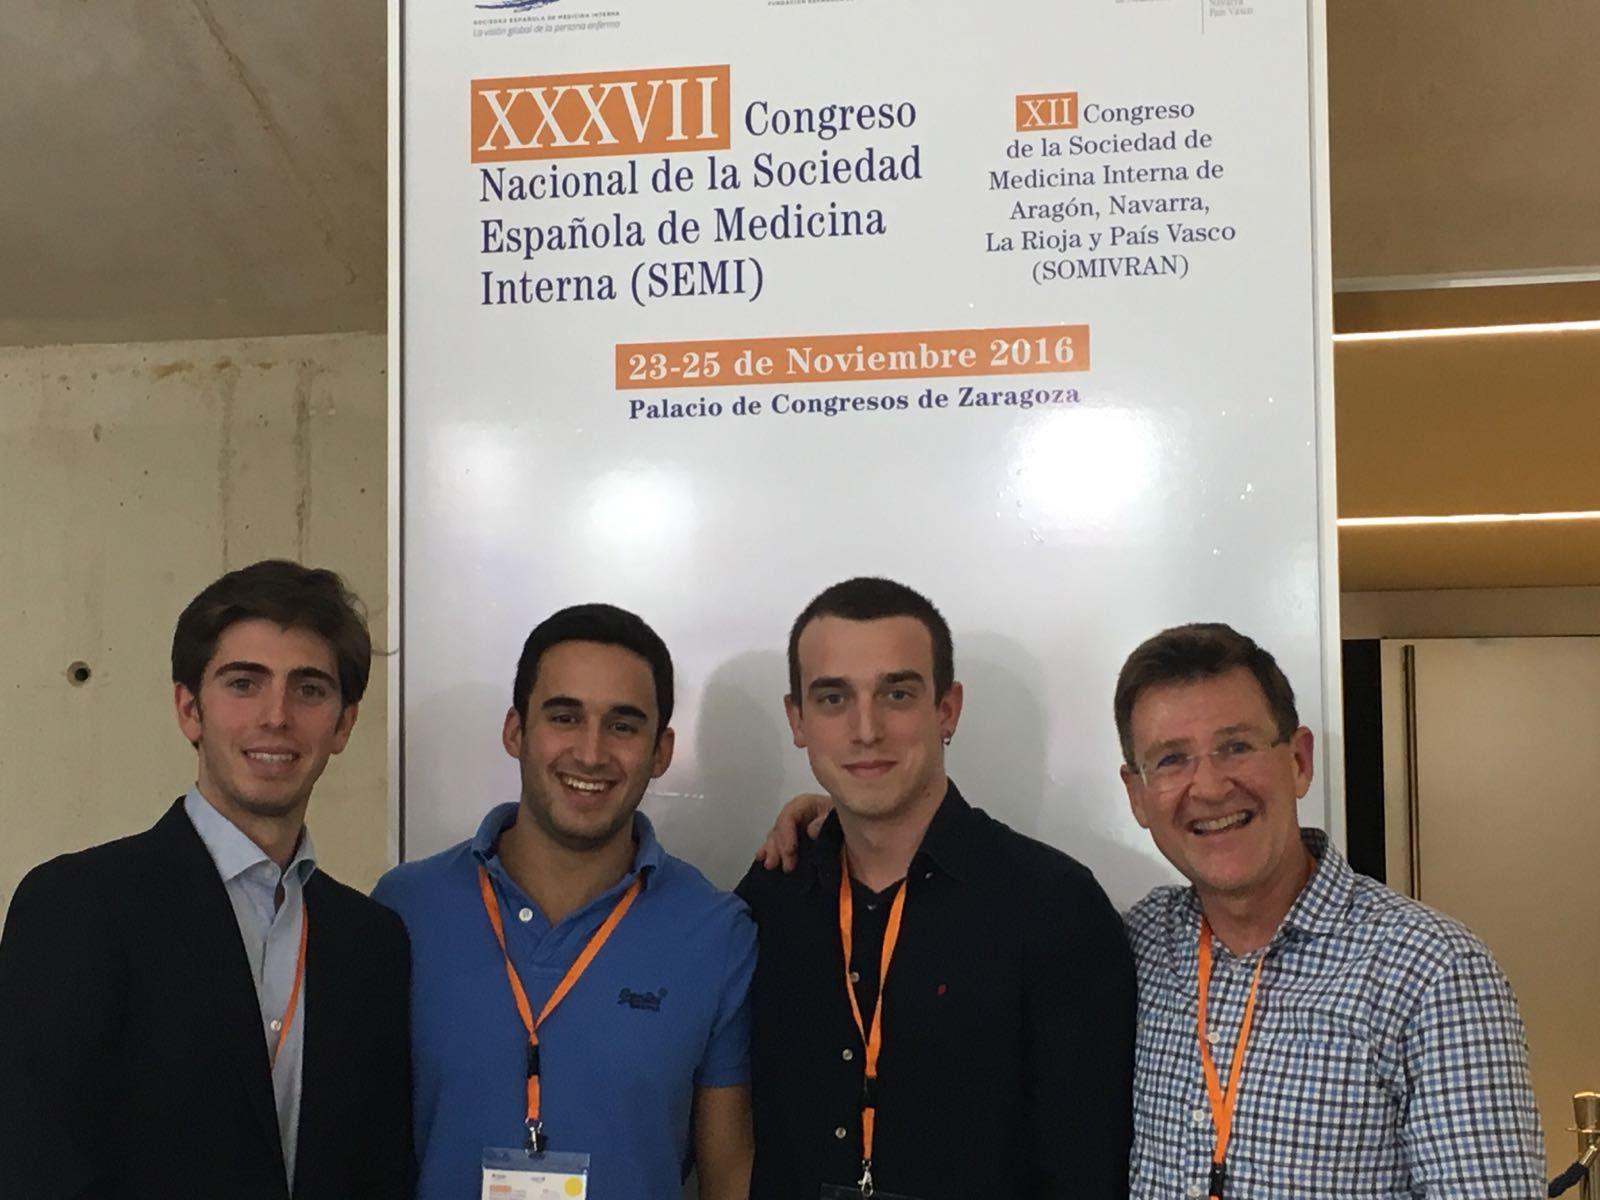 medicina-ceu-uch-congreso-semi-enrique-rodilla-1